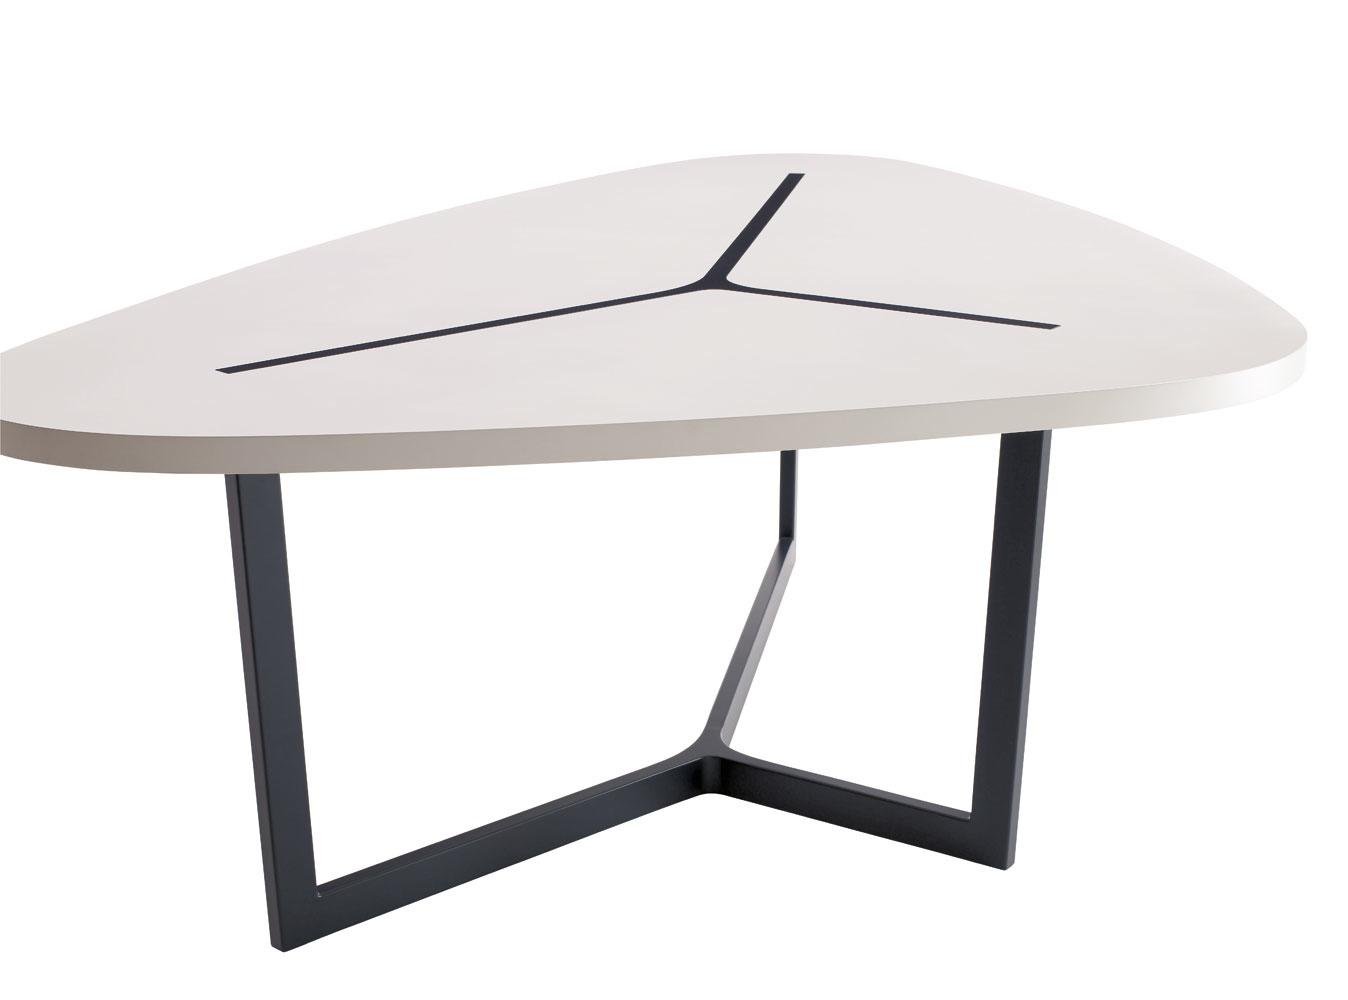 seven table by jean marie massaud b b italia wood. Black Bedroom Furniture Sets. Home Design Ideas